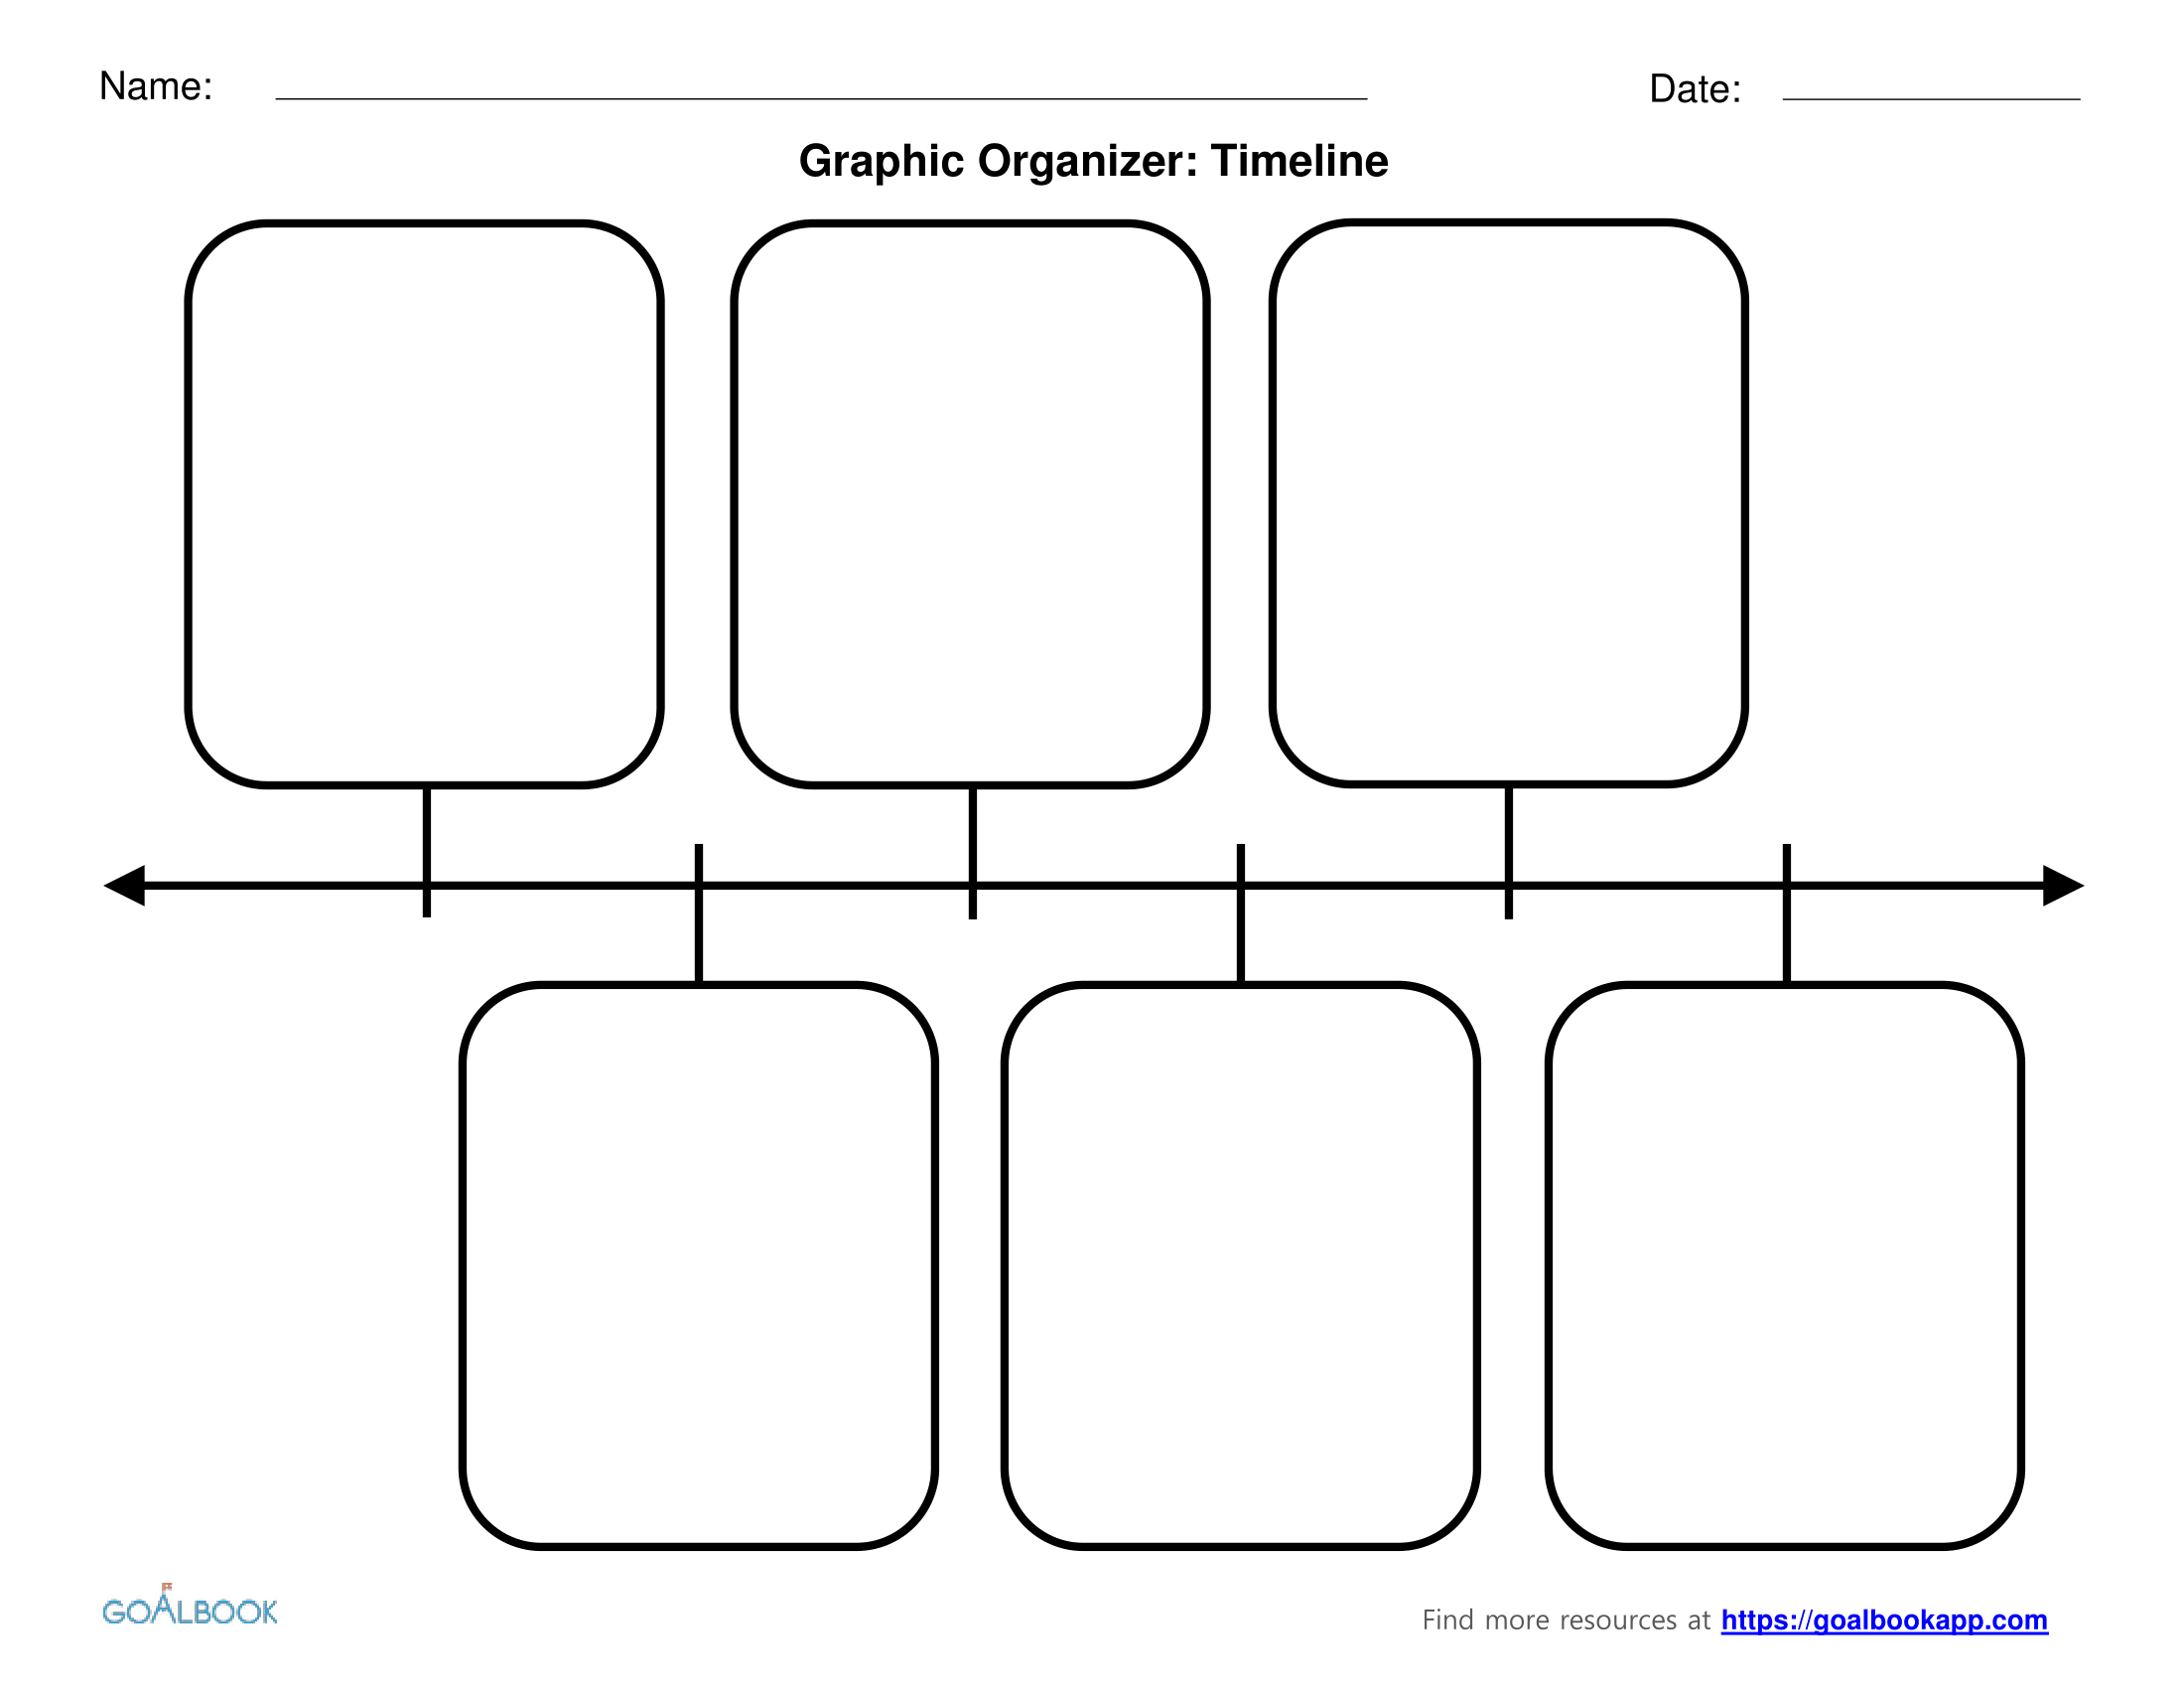 Printable Math Graphic Organizers 03 Timeline Blank ~ Themarketonholly - Free Printable Graphic Organizers